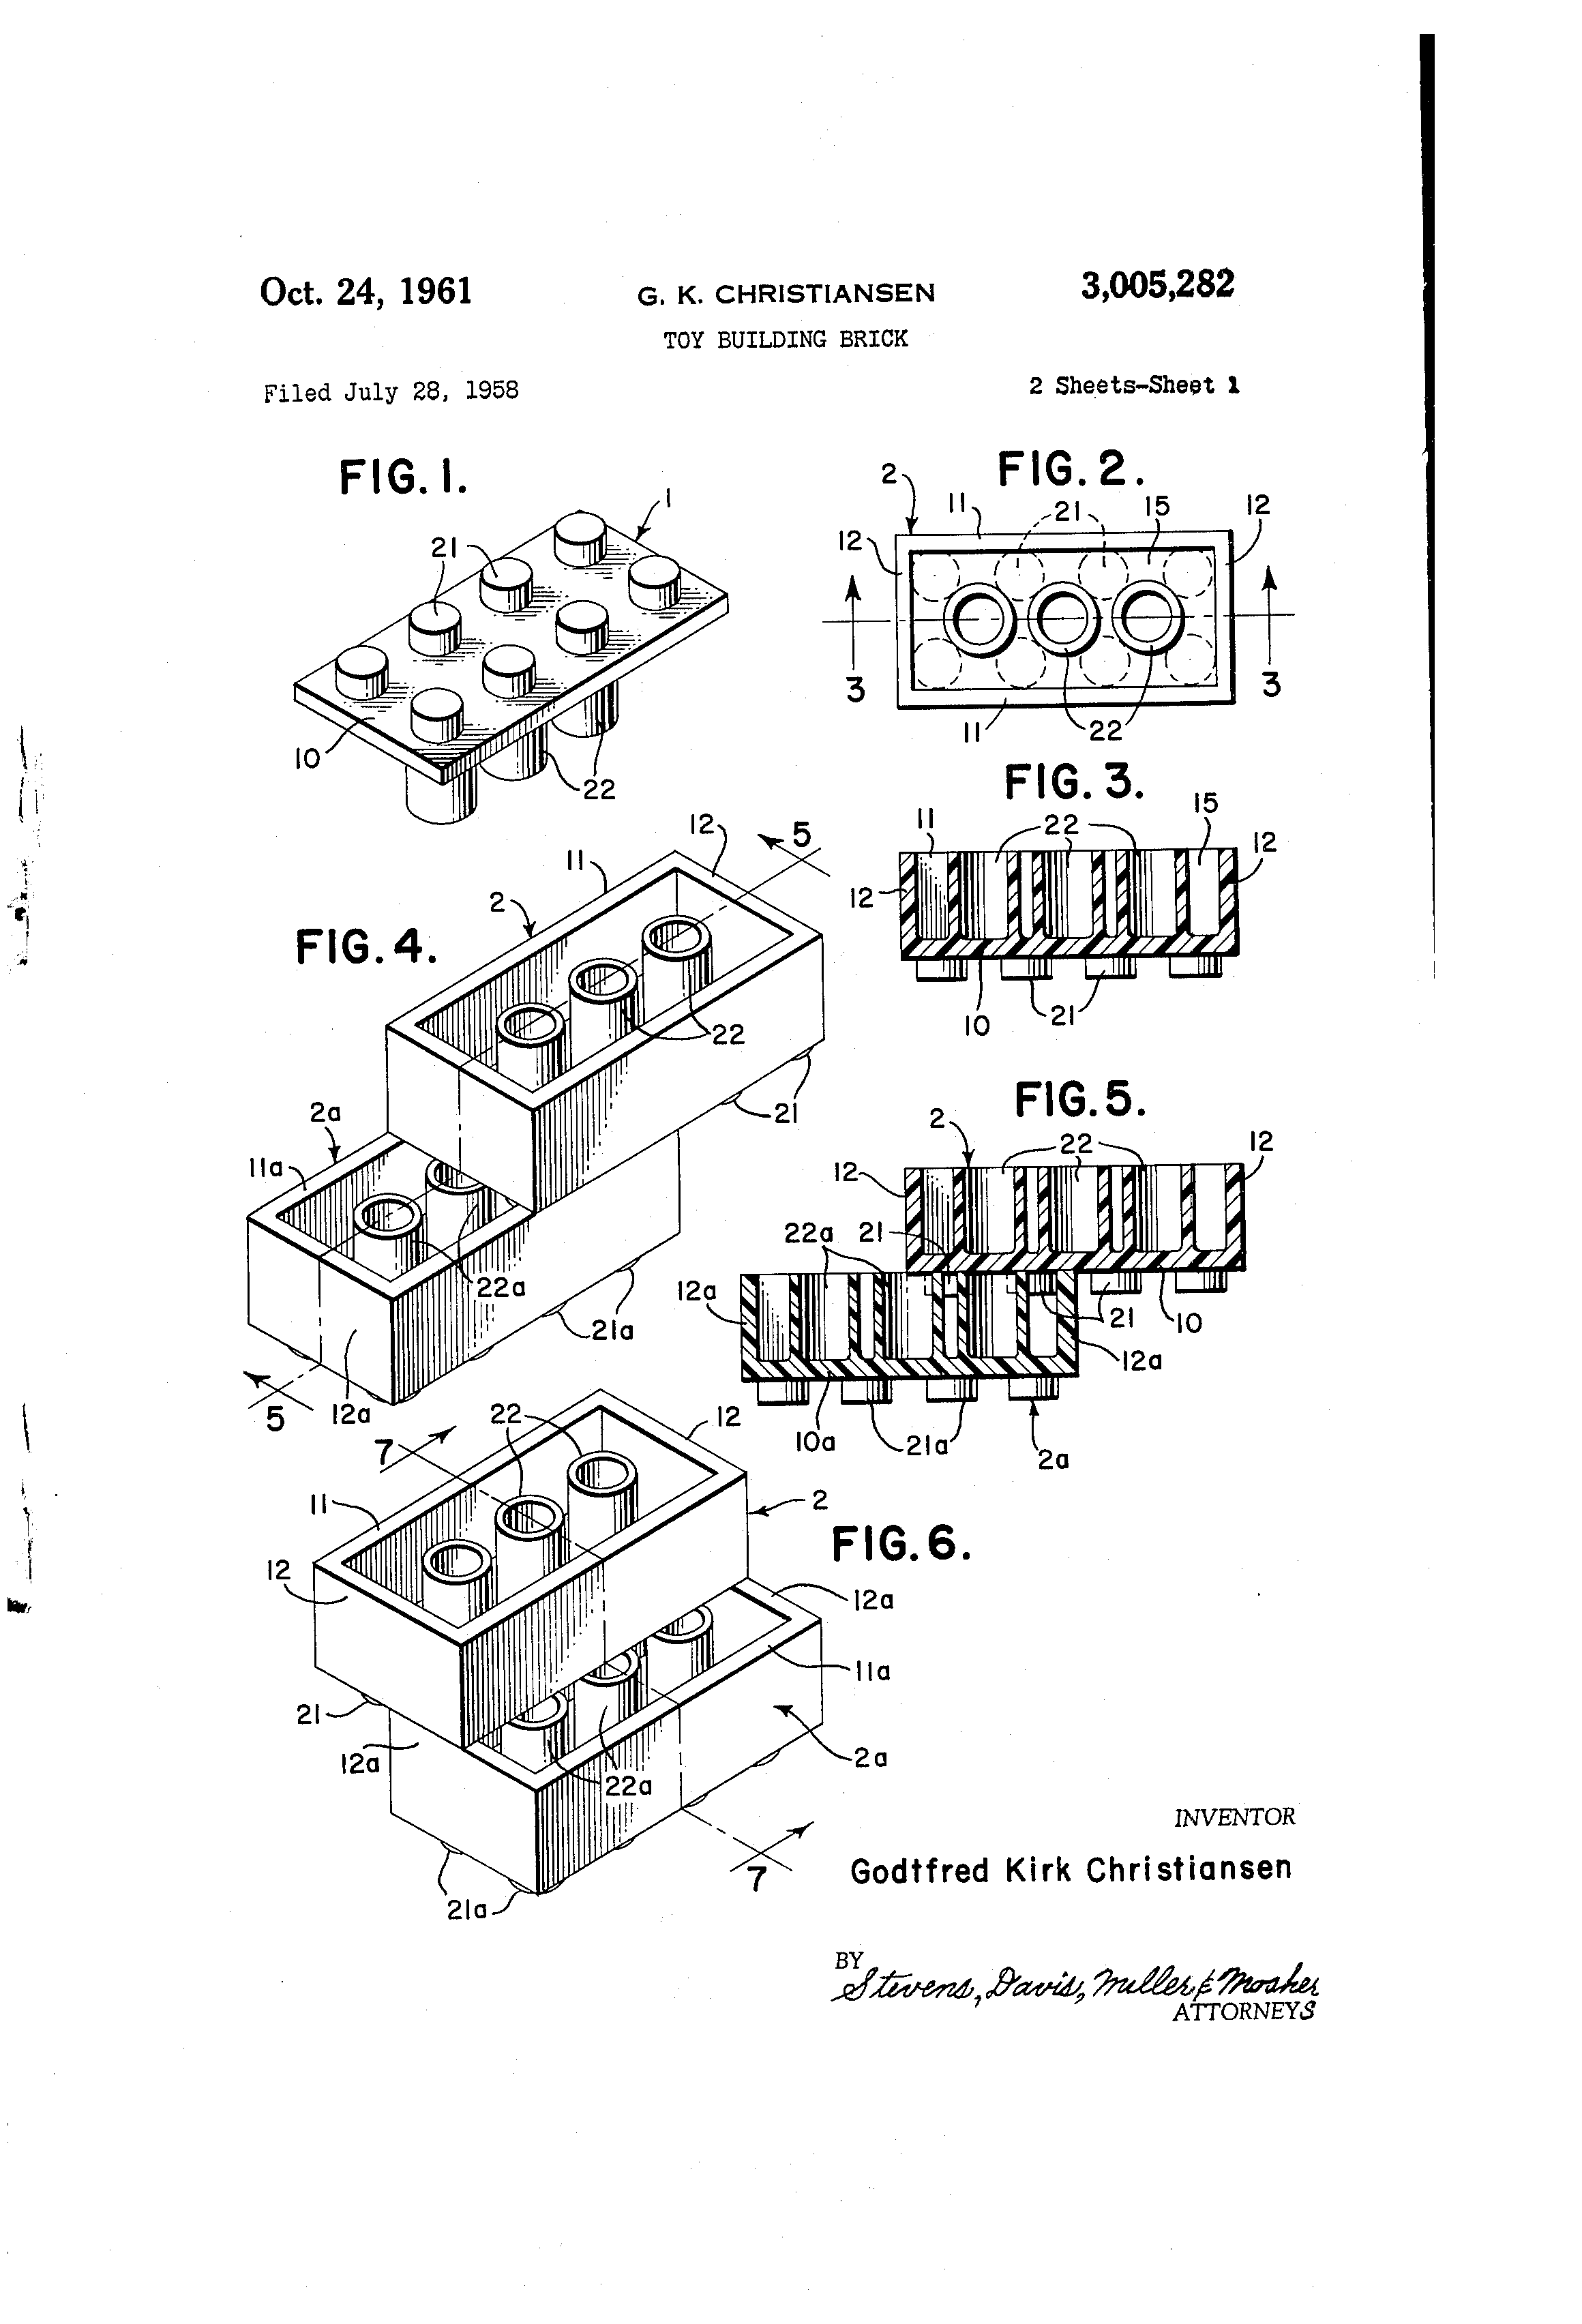 US Patent 3,005,282 Toy Building Brick image (LEGO brick)